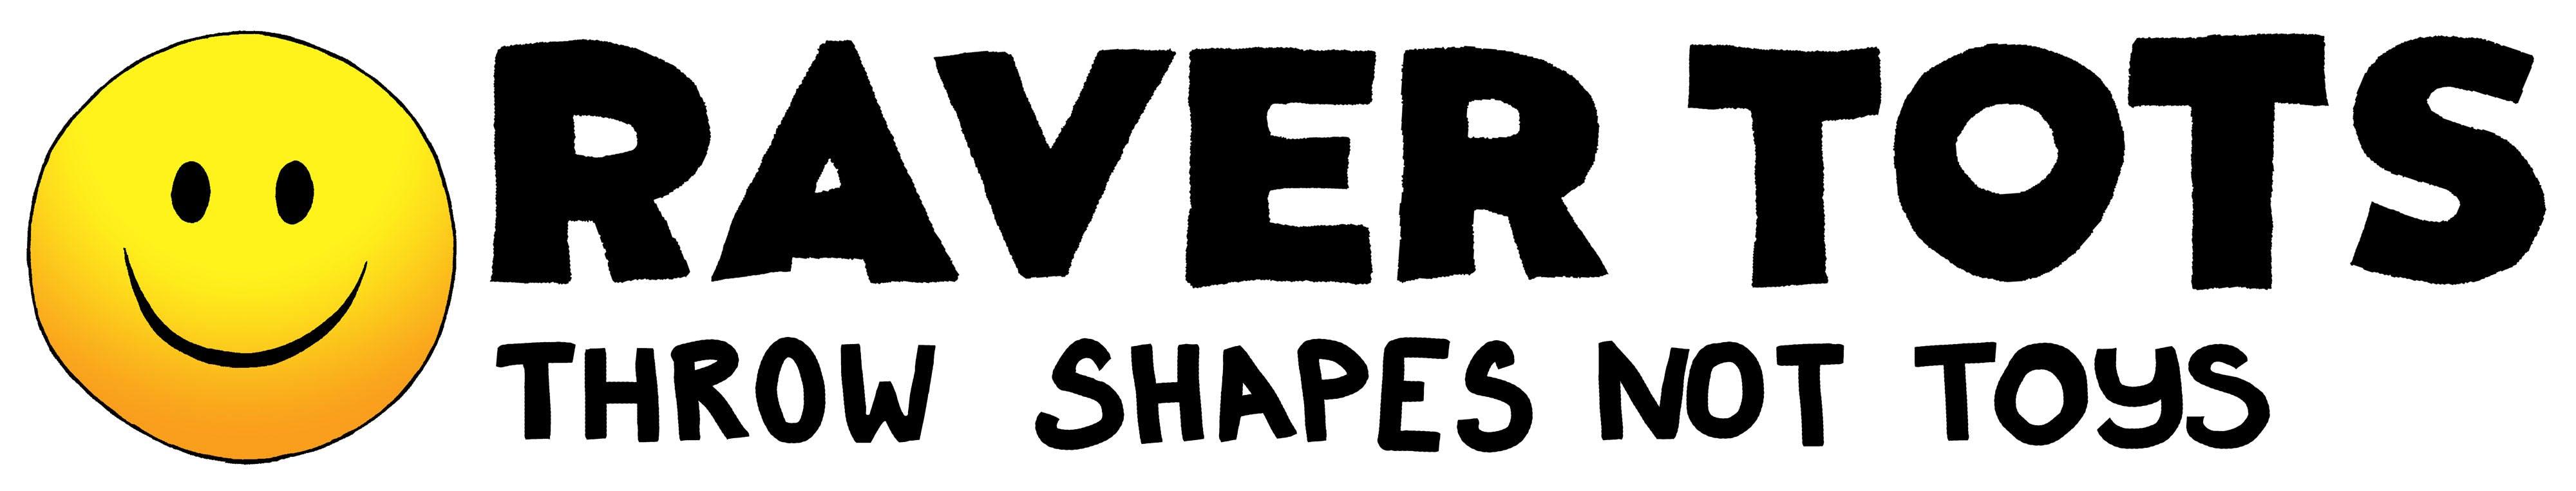 Raver Tots Logo